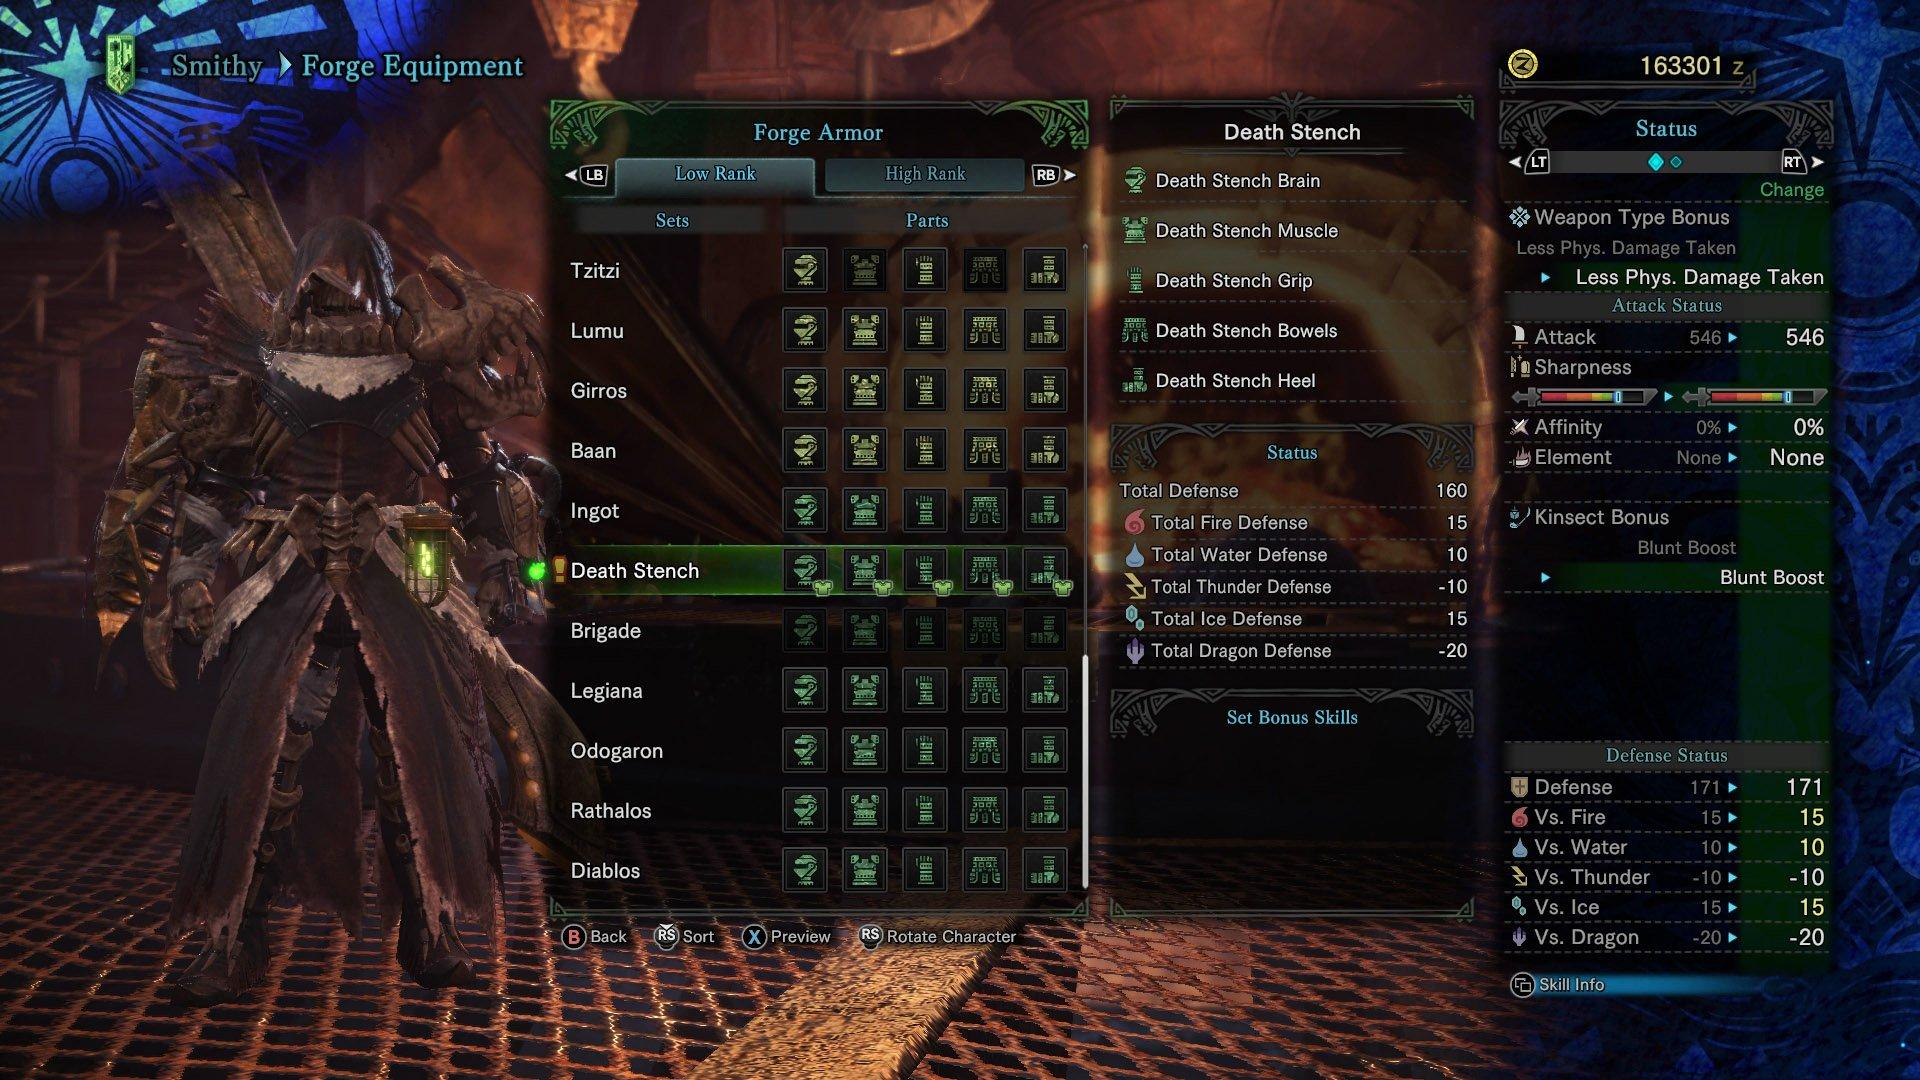 monster hunter world death stench armor